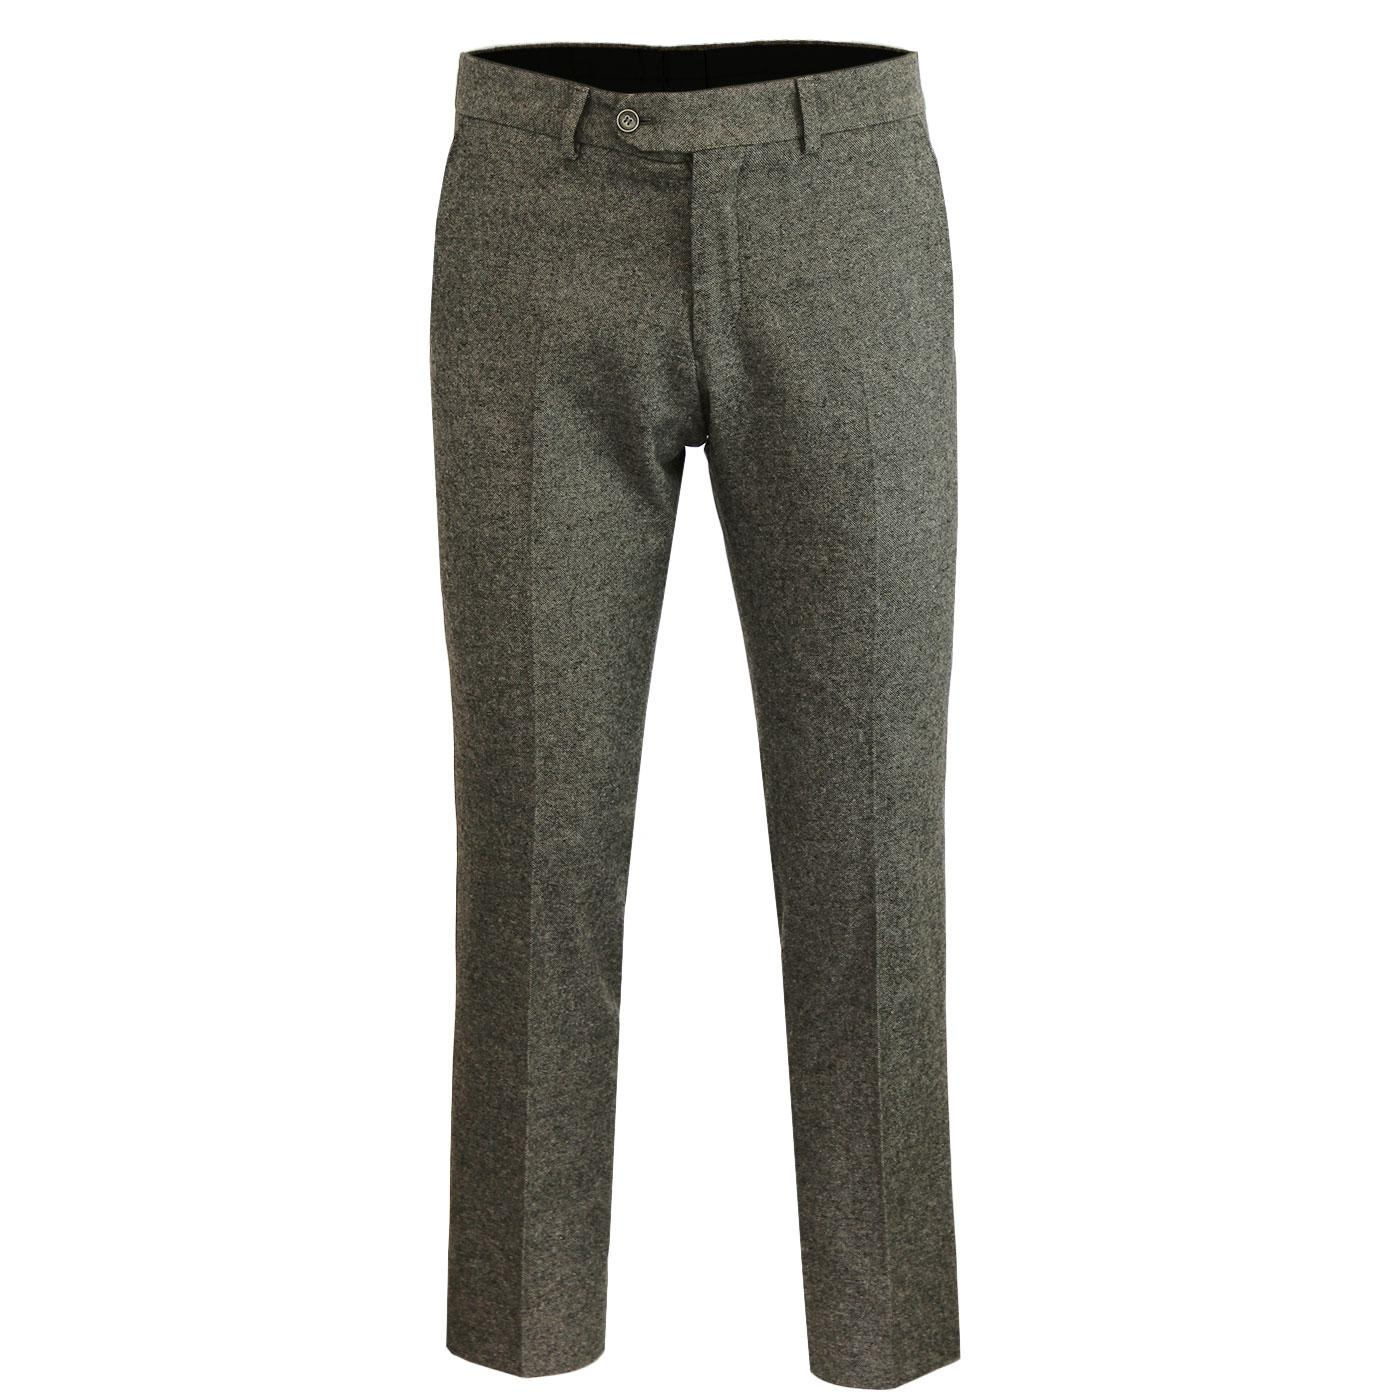 Men's Retro Mod Slim Taupe Donegal Suit Trousers